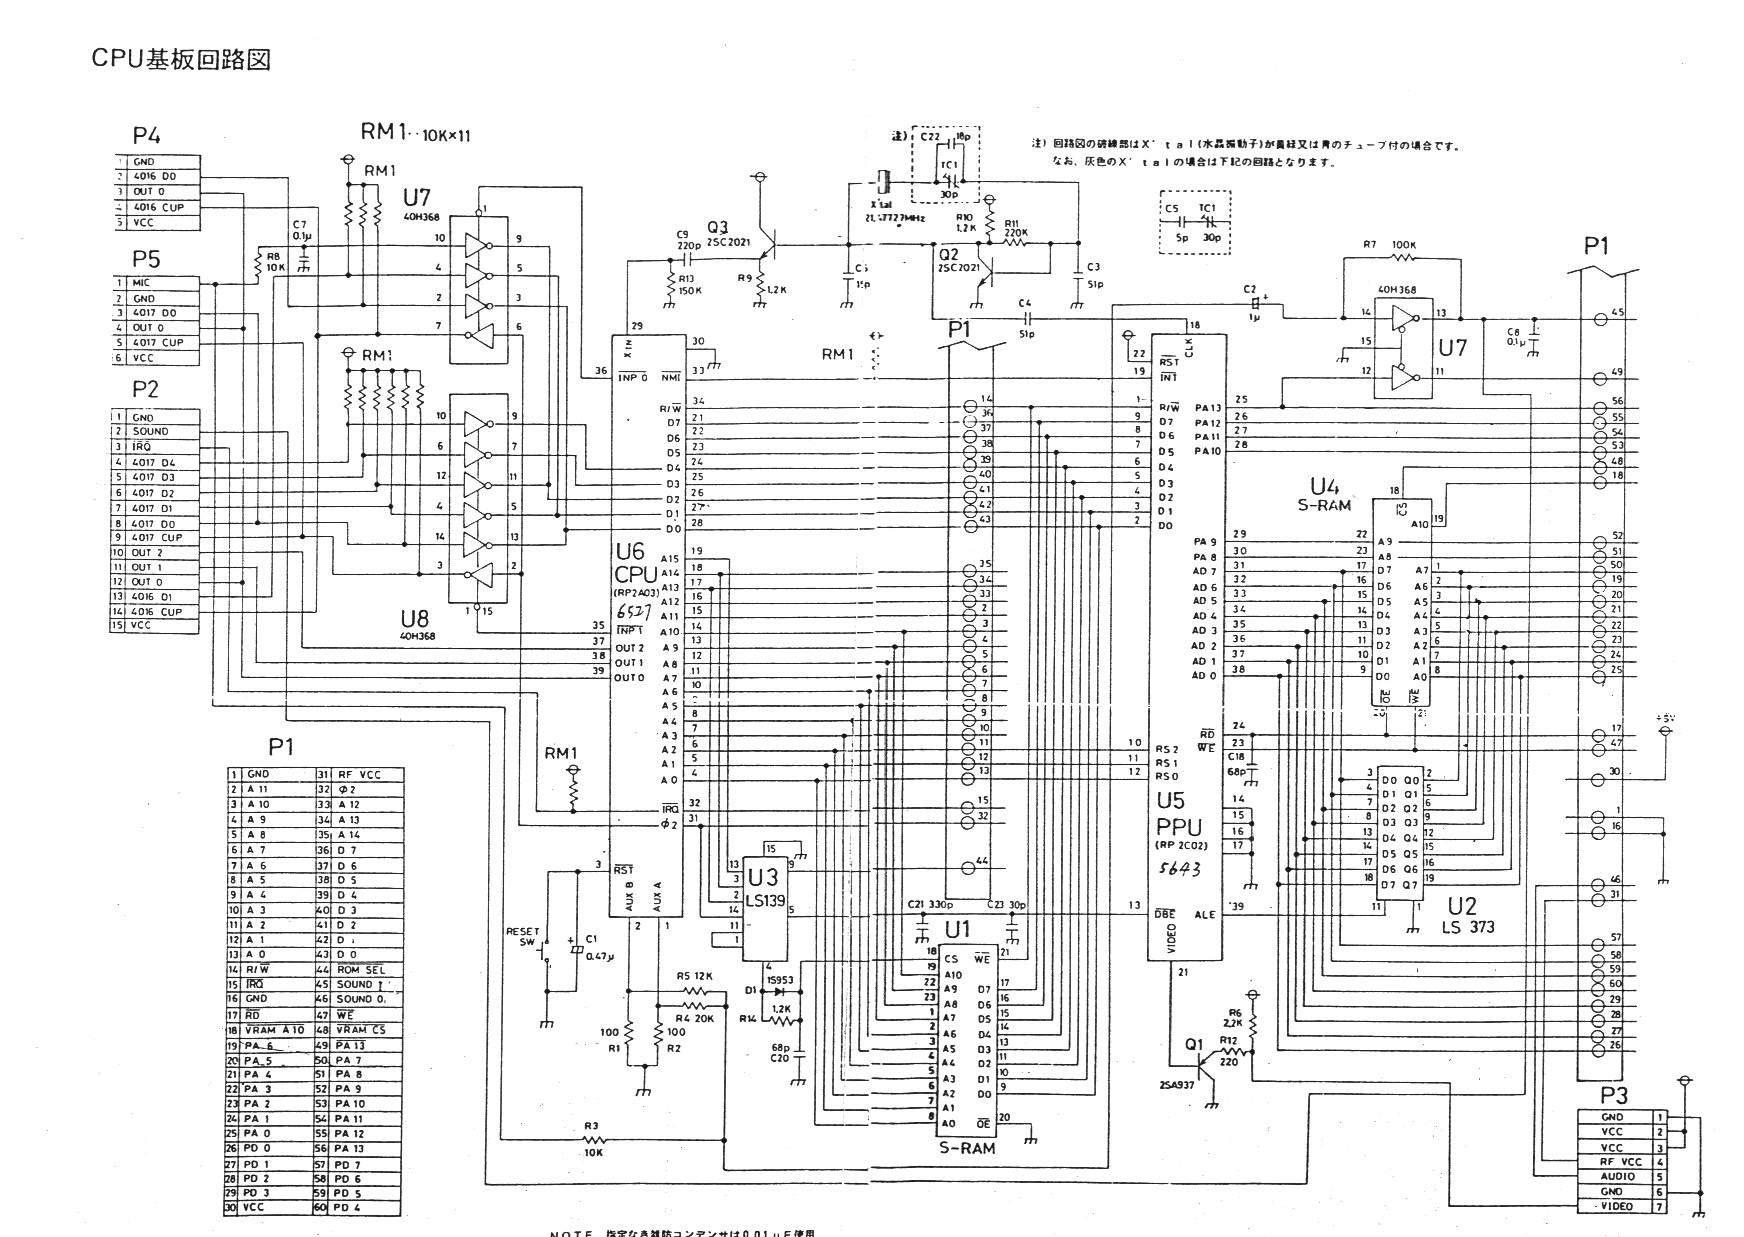 Nes Wiring Diagram - Schema Diagram Preview on